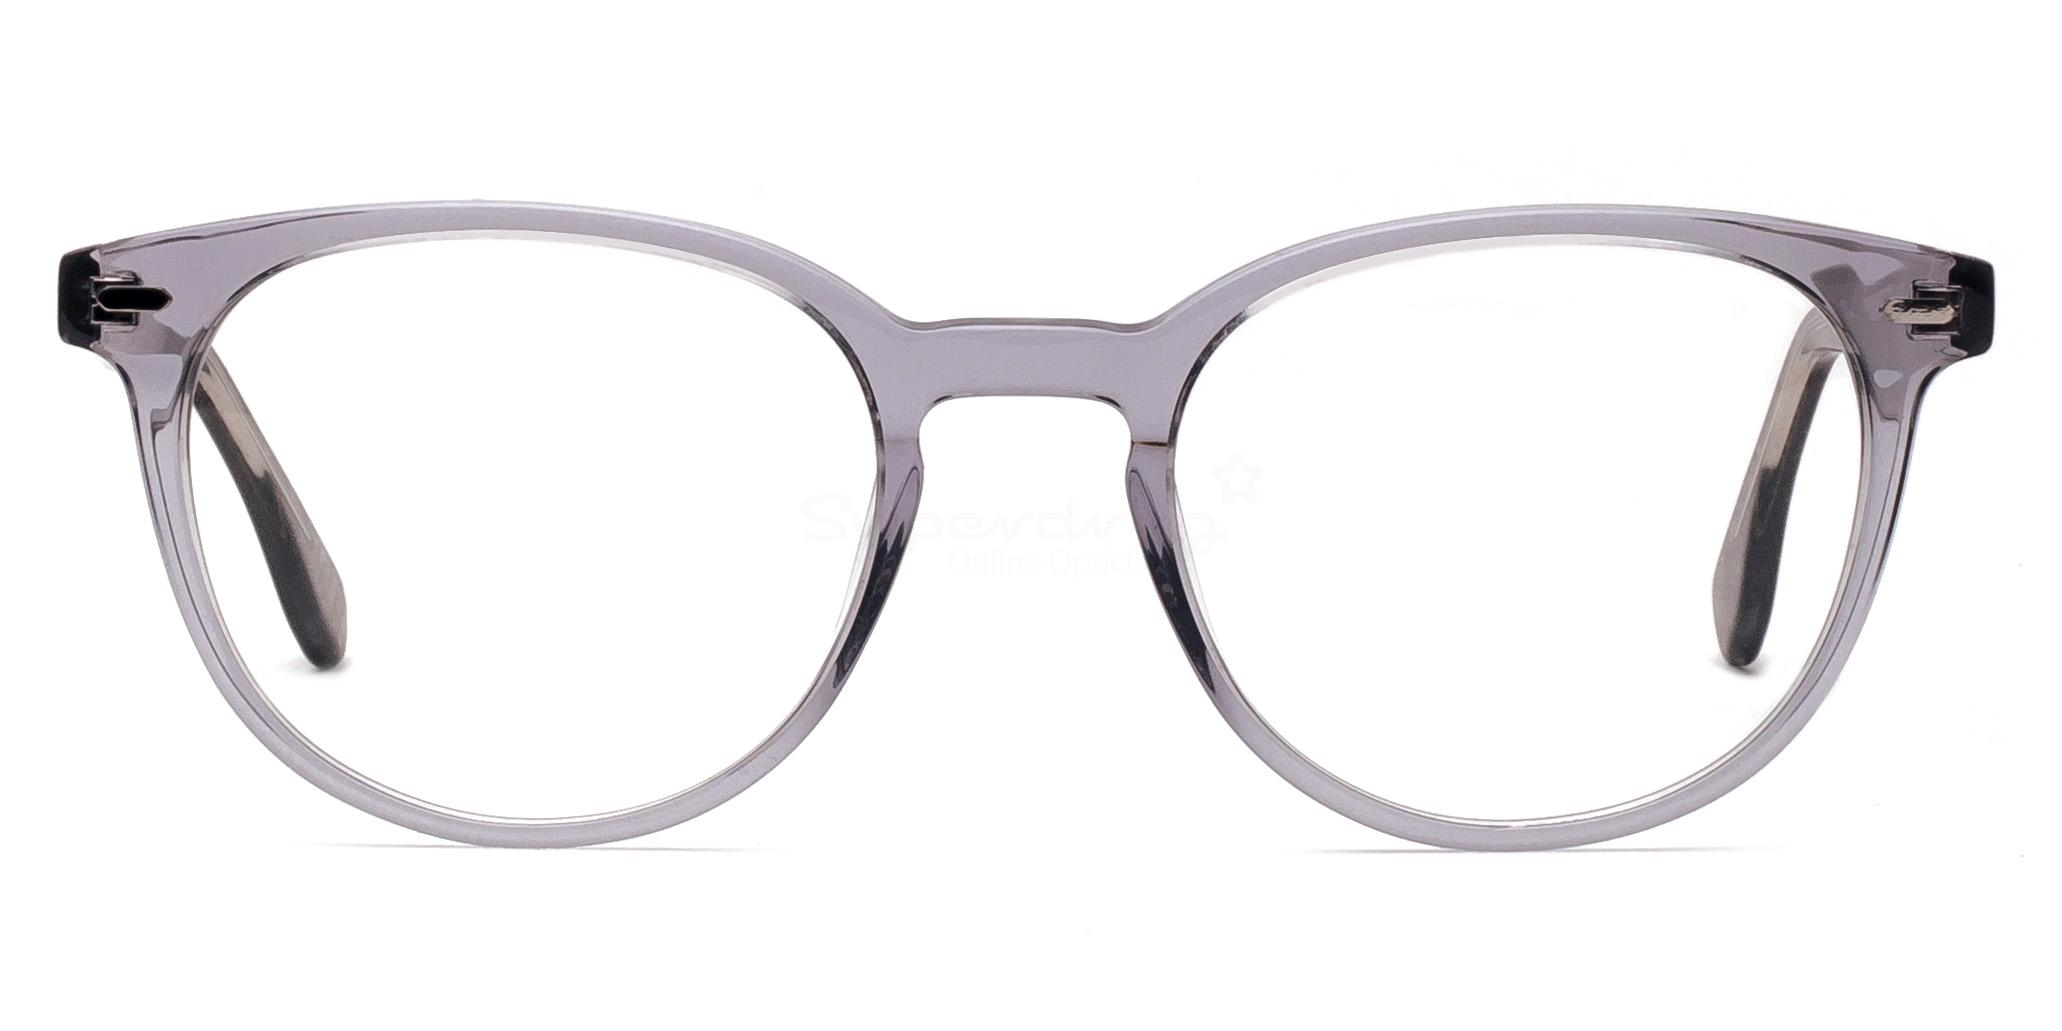 C1 17274 Glasses, Krypton